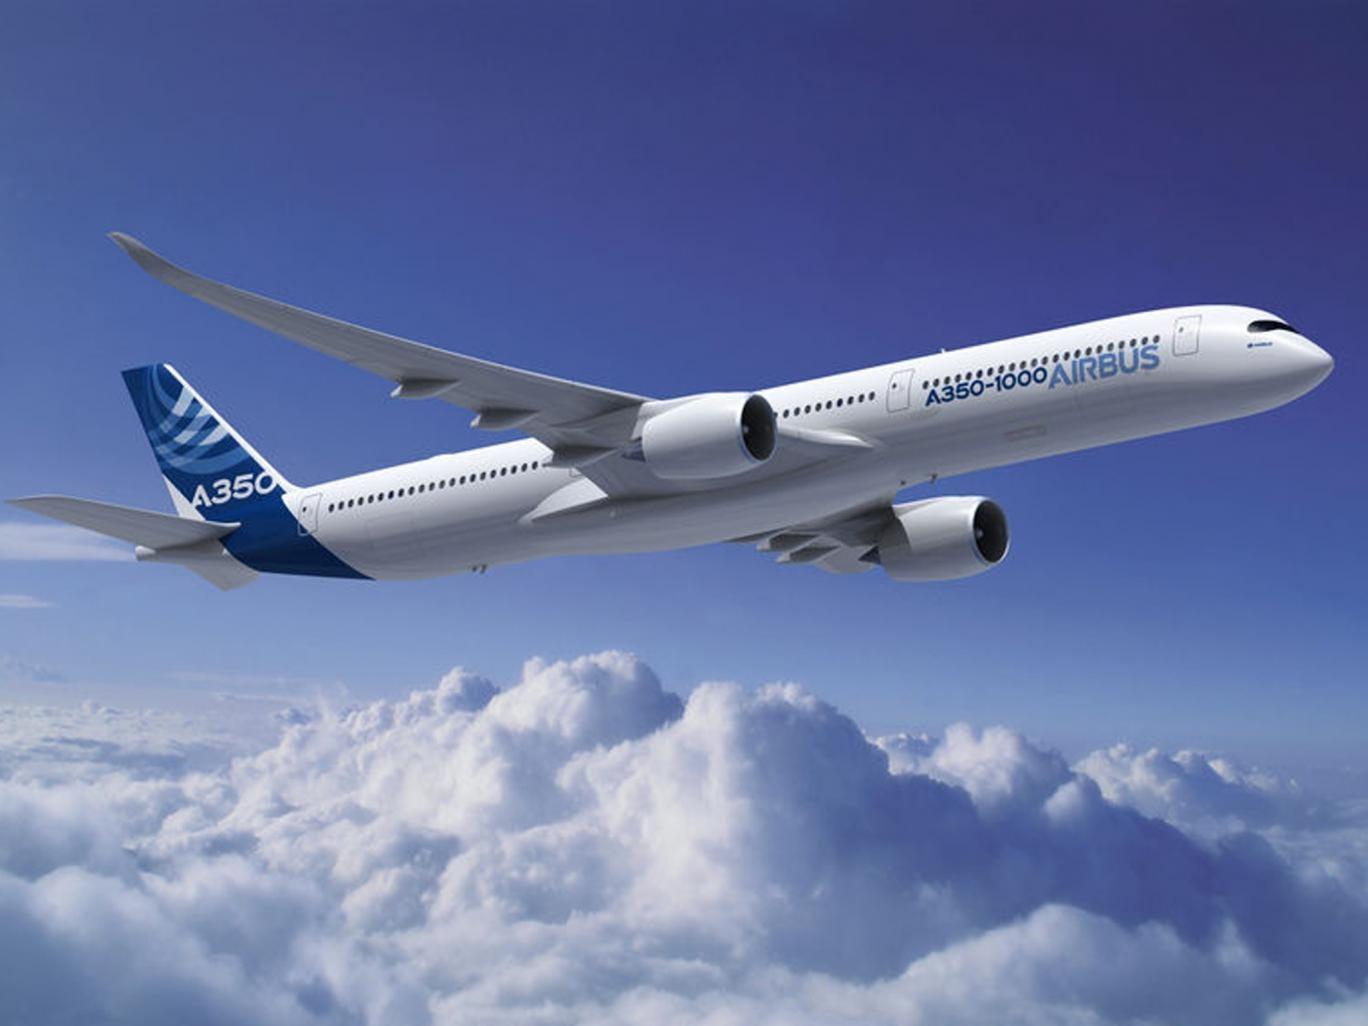 New Airbus A350 aircraft